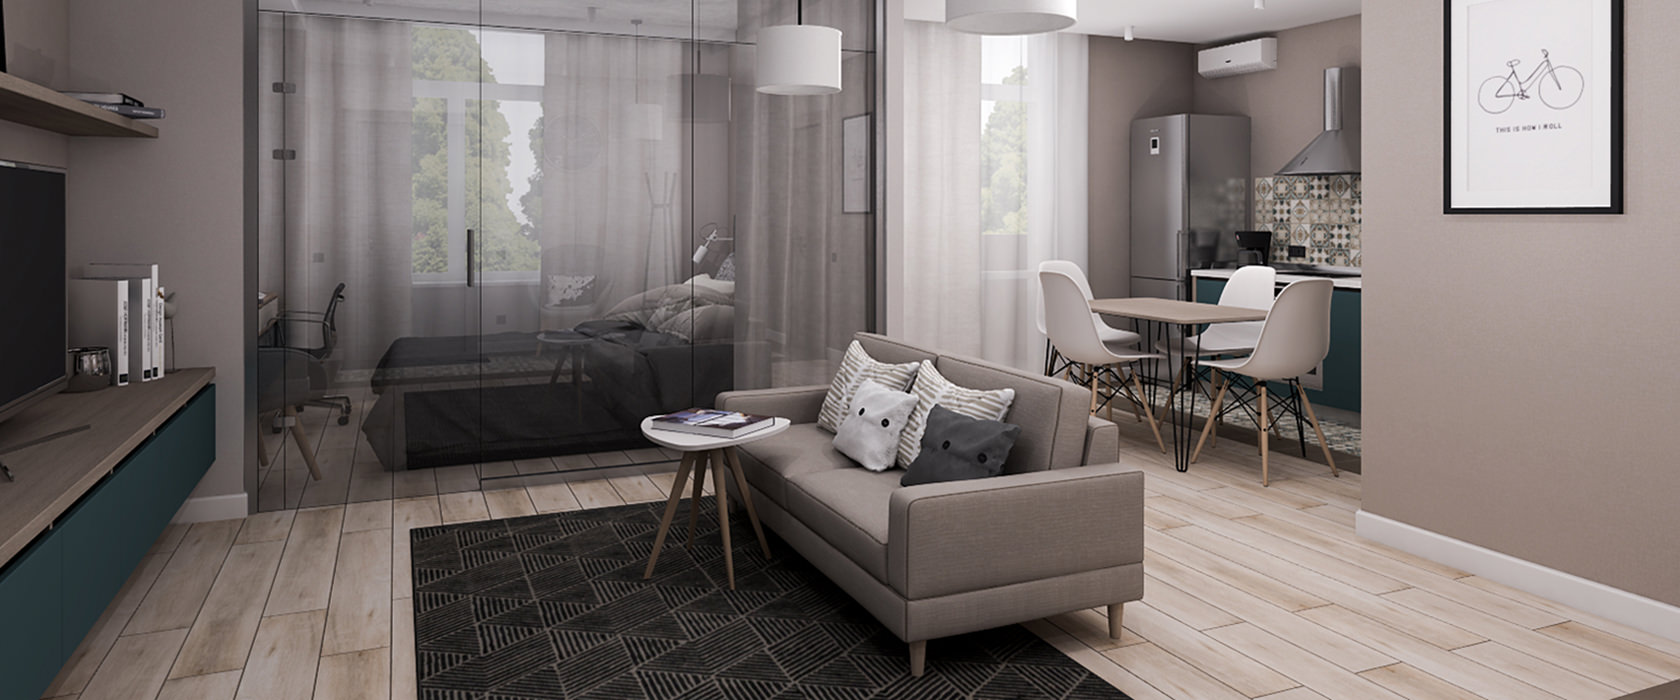 Двухместный диван Bruno - Фото 2 - Pufetto